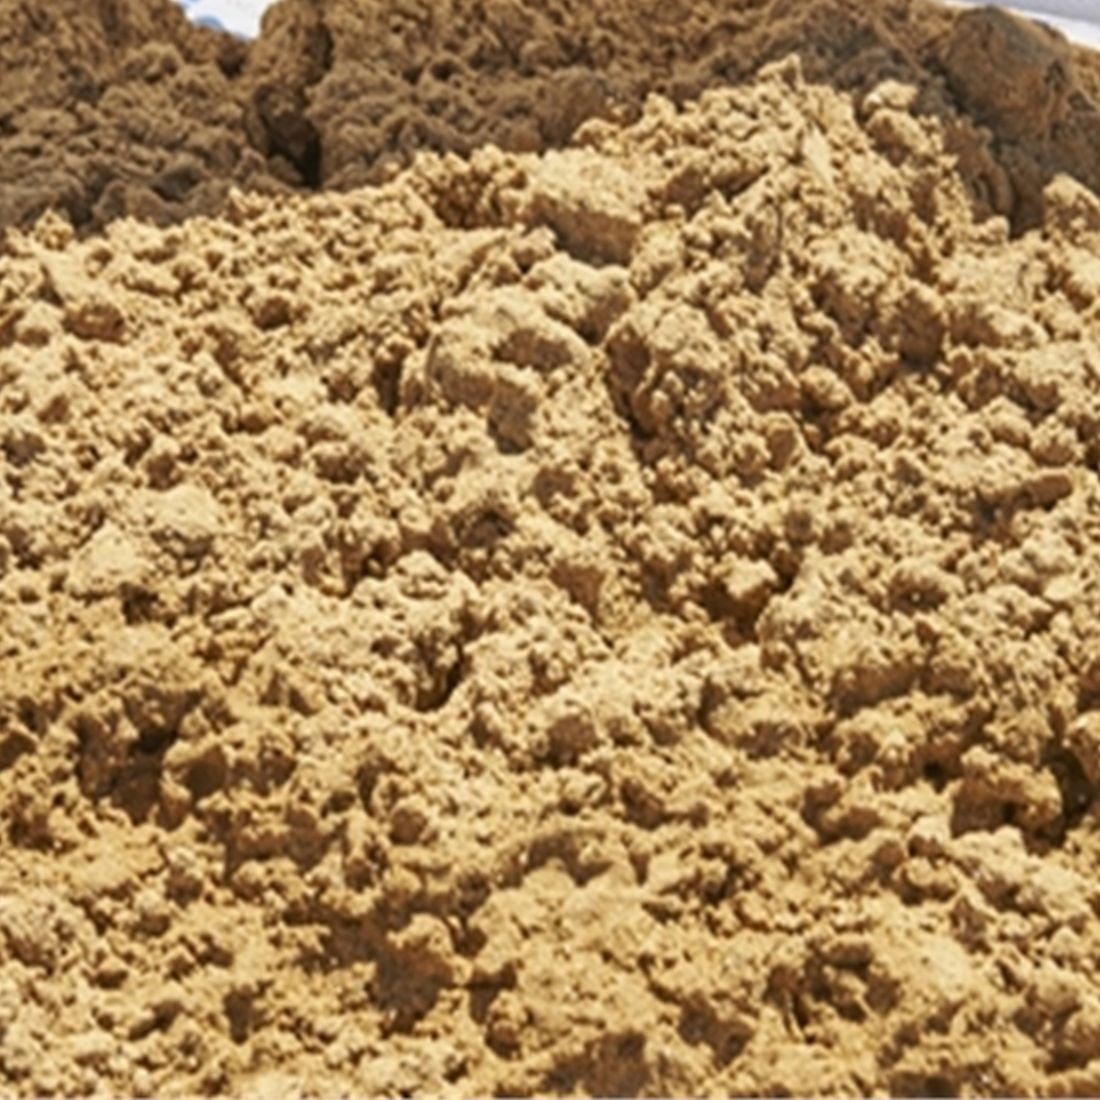 Masonry Sand (natural) $35/Scoop (1/2 yd)